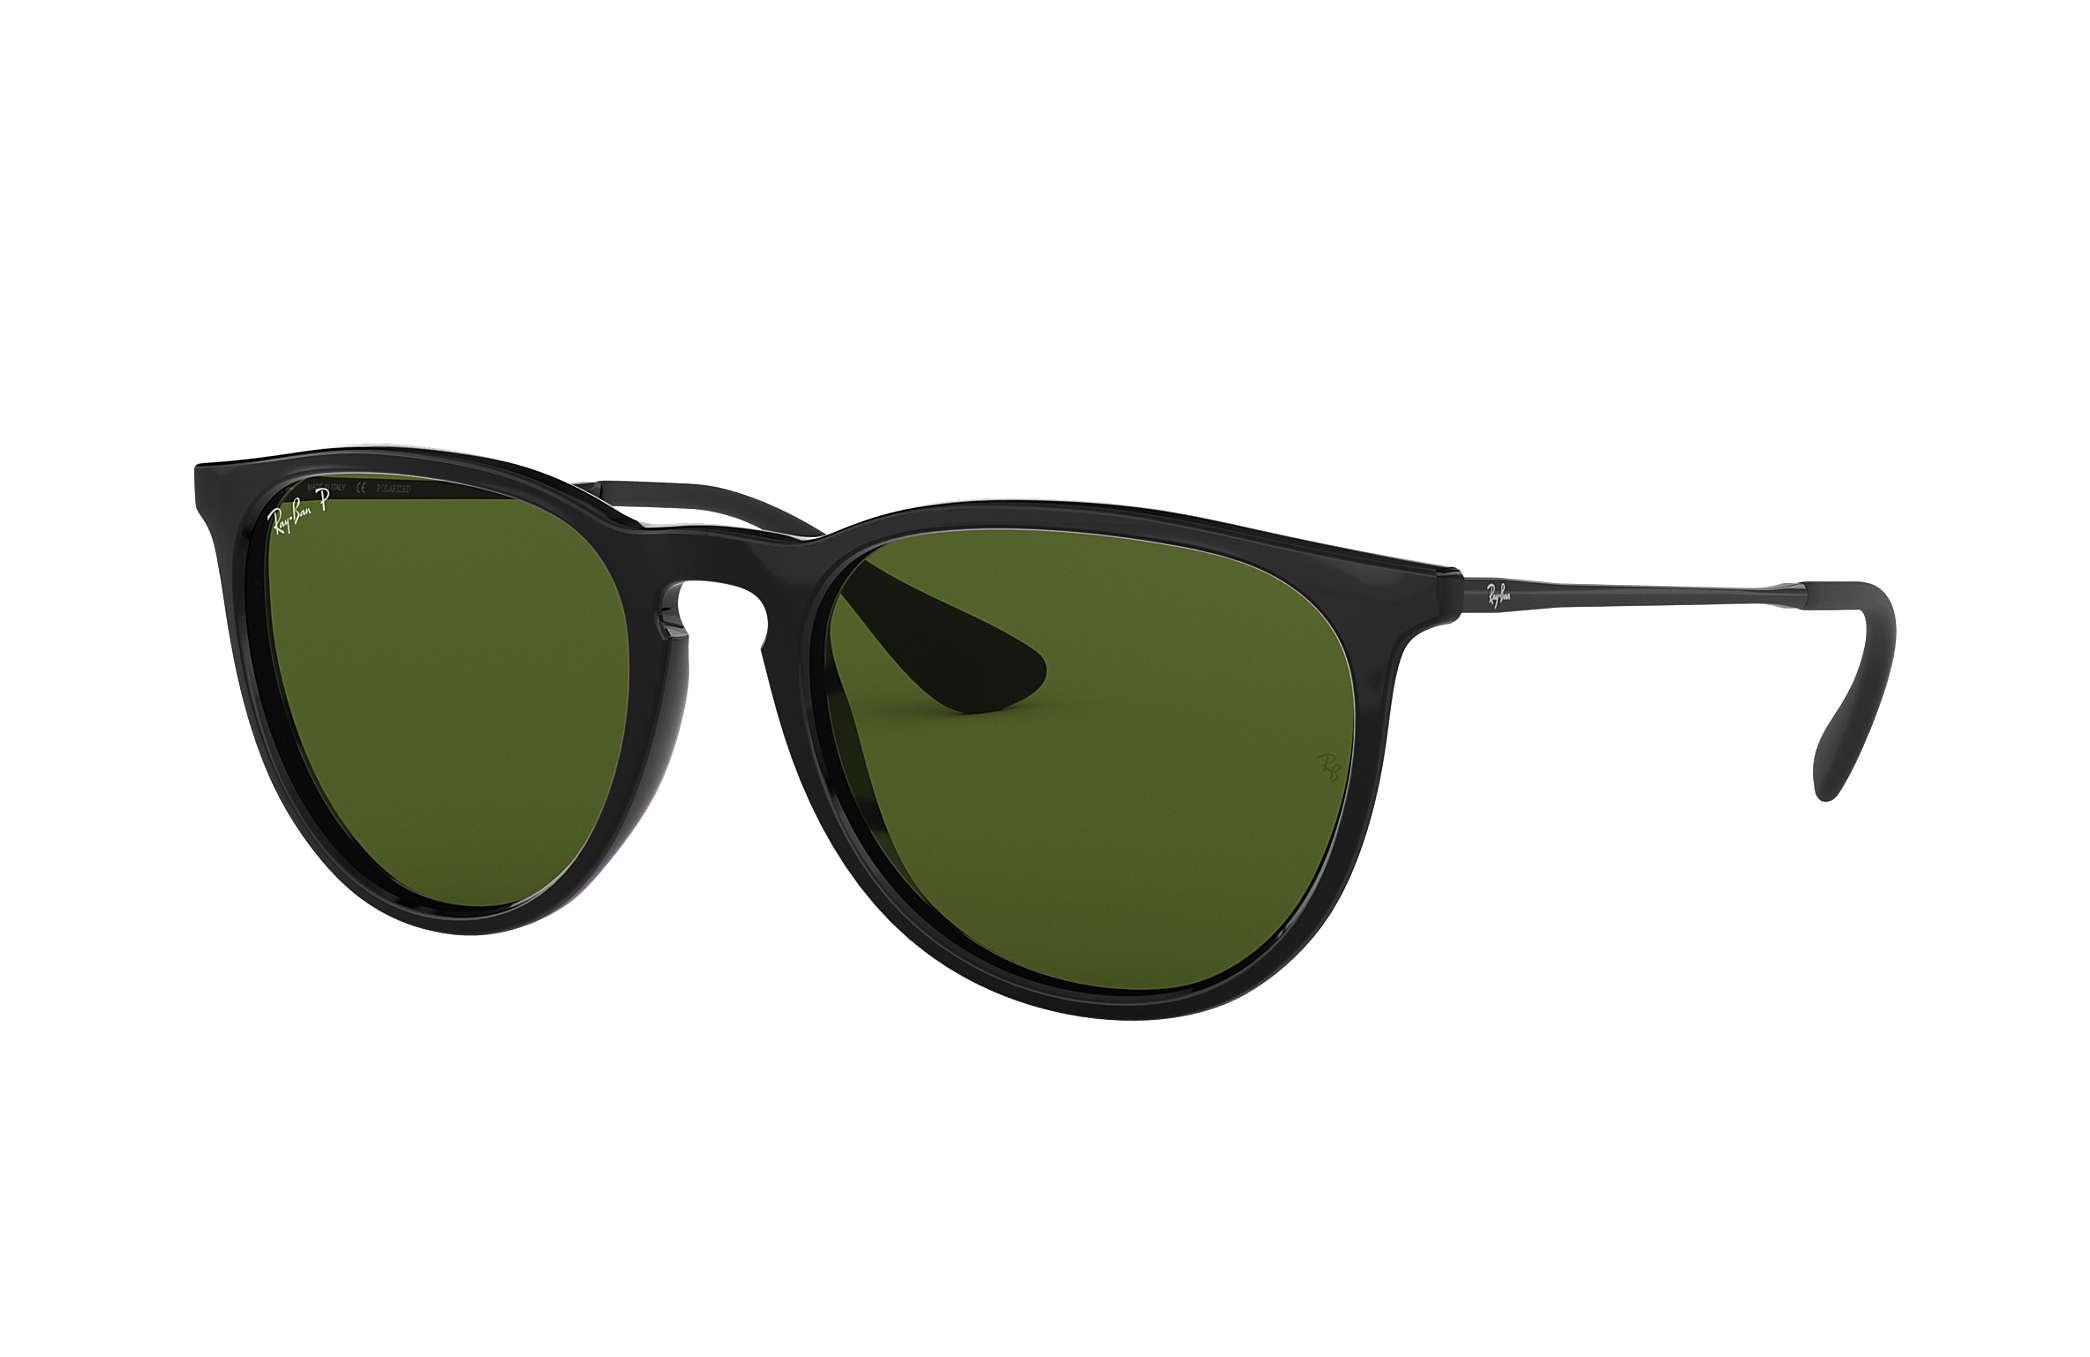 699ca8523a2a0 Ray-Ban Erika Classic RB4171 Black - Nylon - Green Polarized Lenses ...